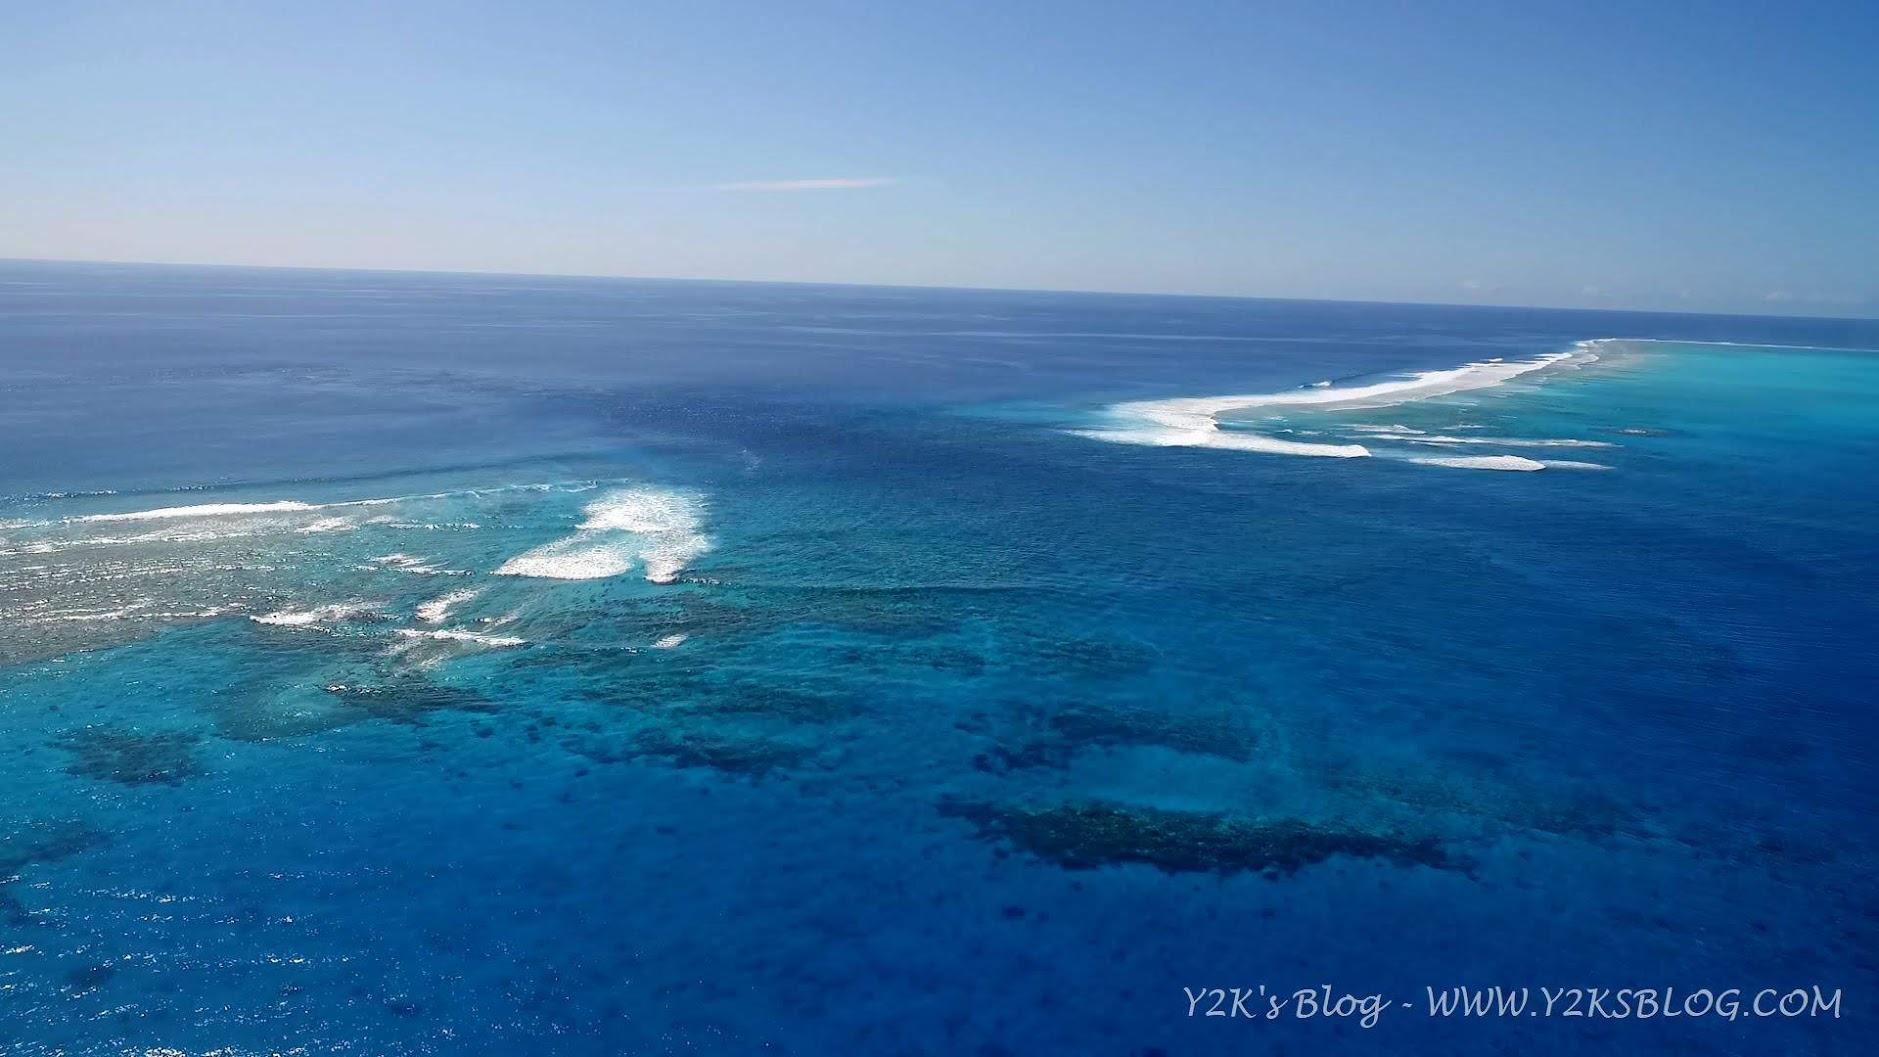 Dal drone: la pass di Beveridge Reef